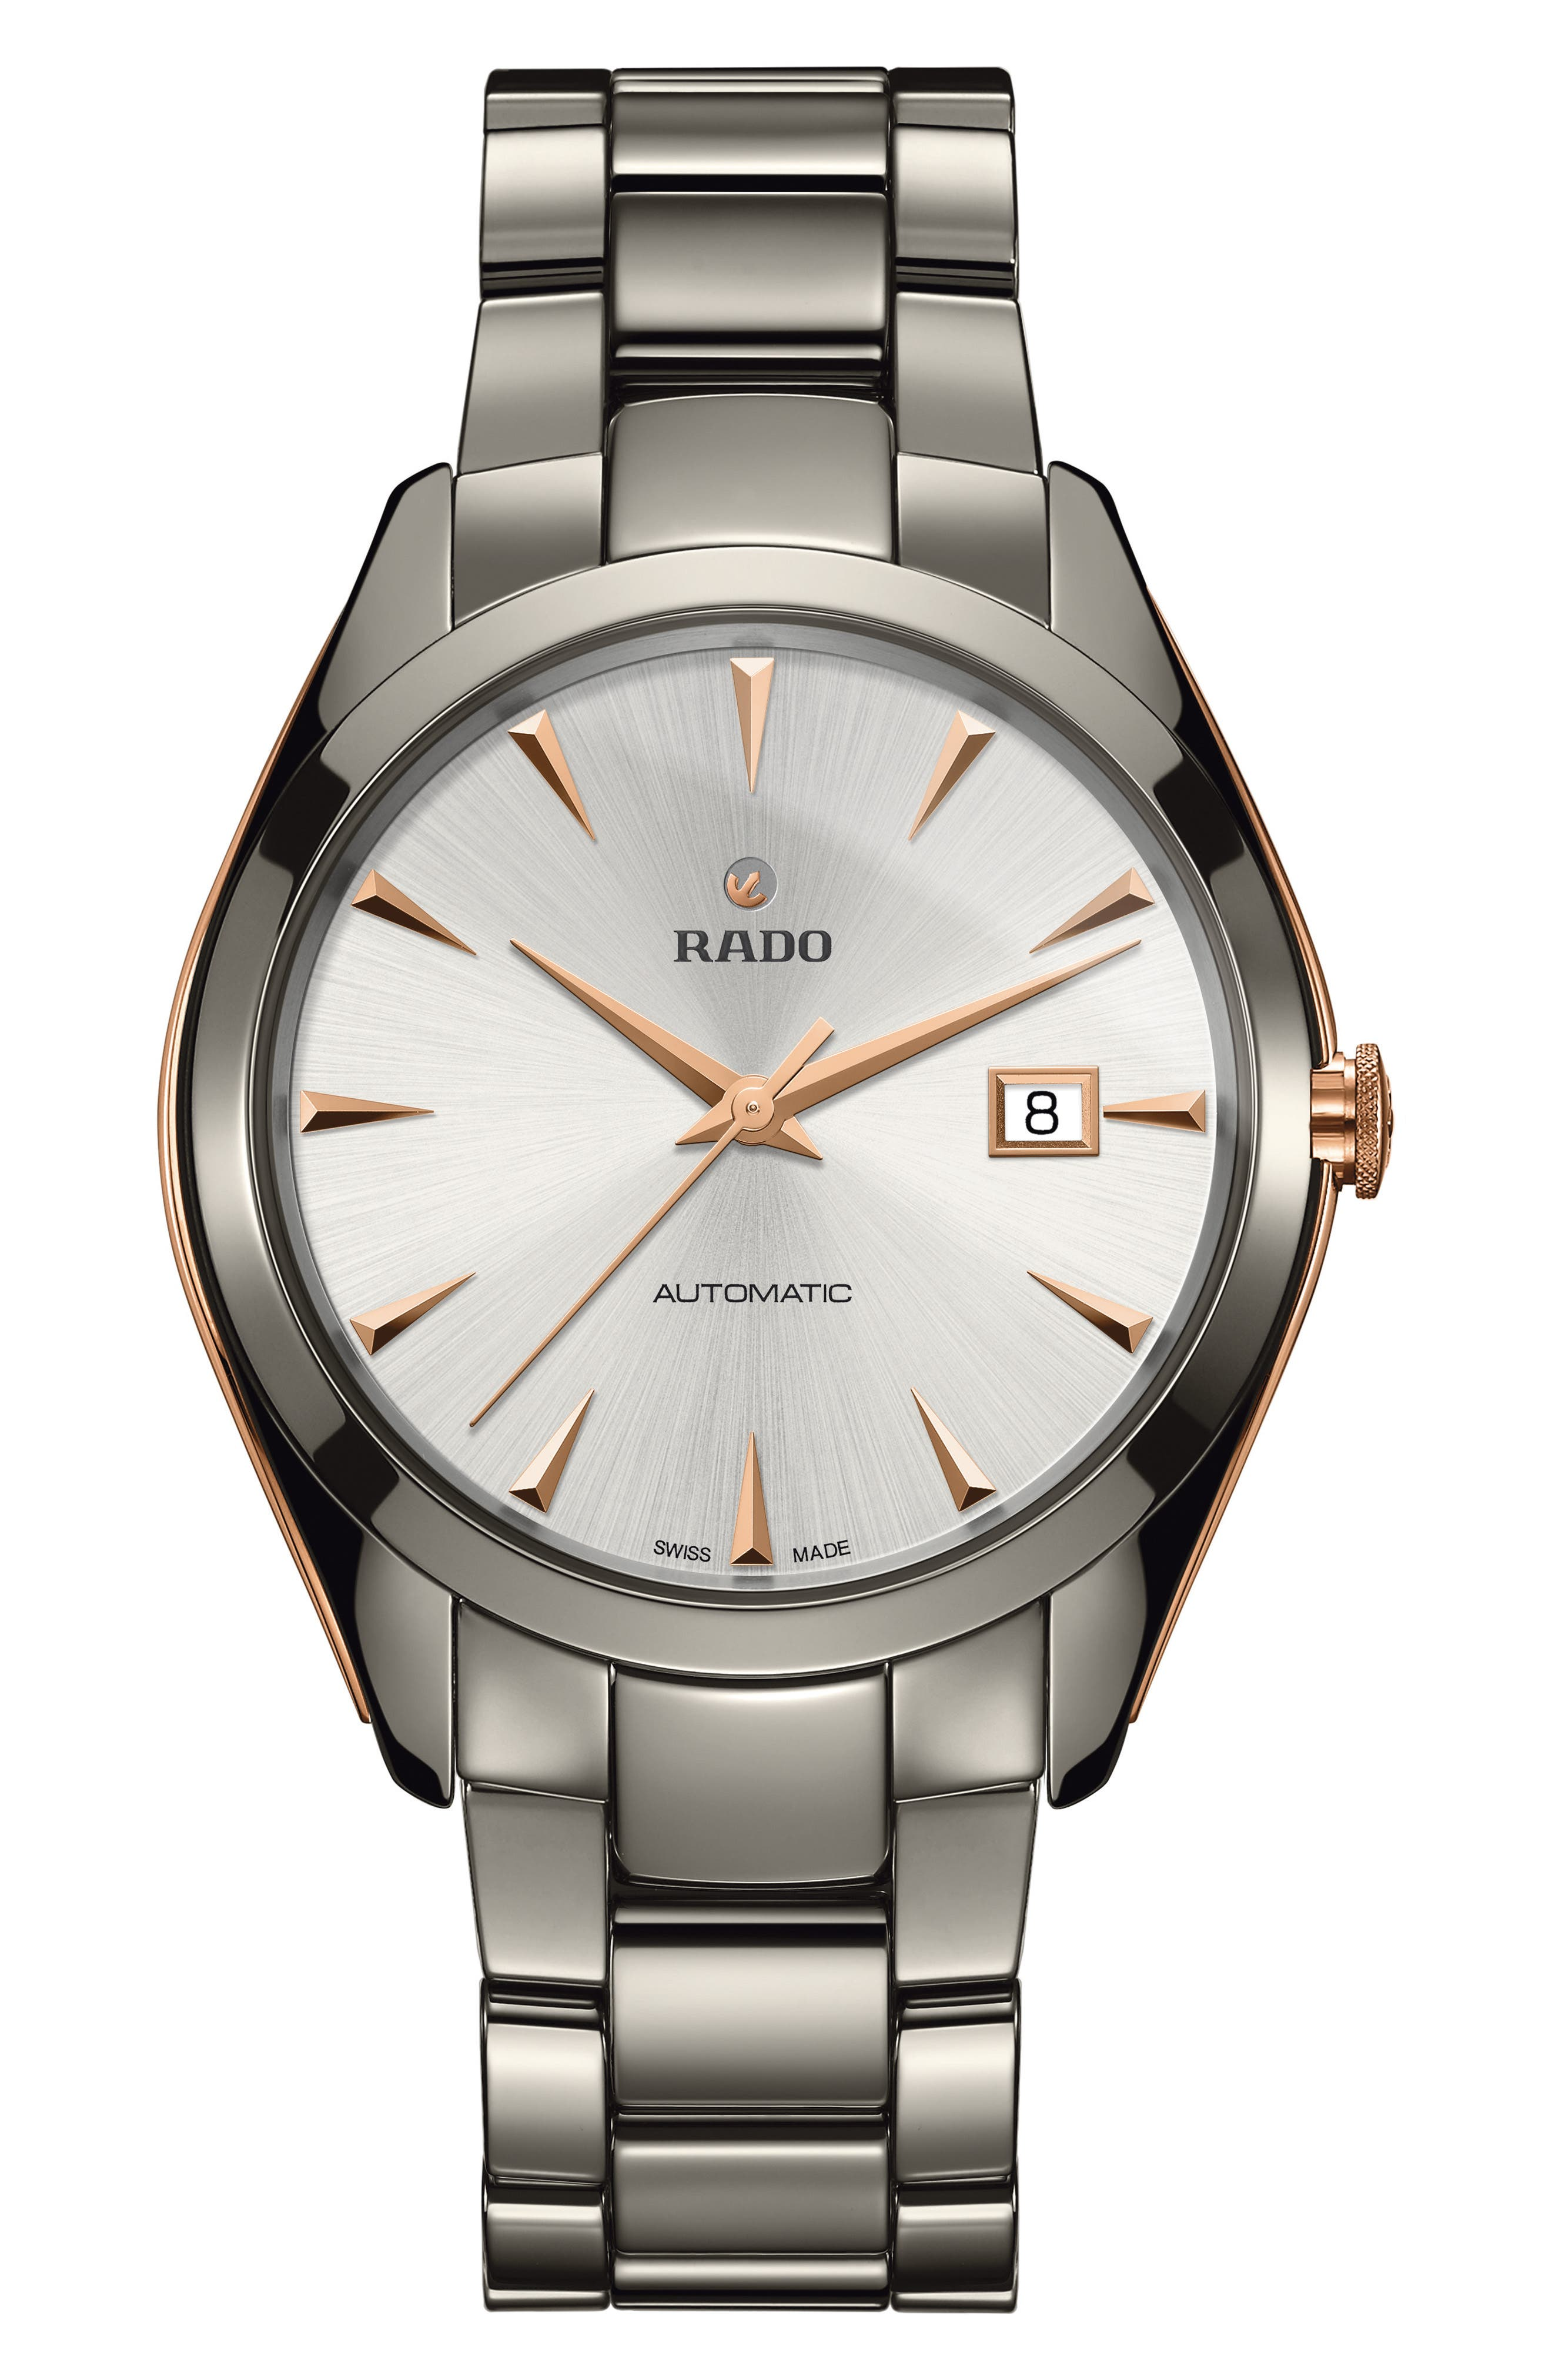 Main Image - RADO HyperChrome Automatic Bracelet Watch, 42mm